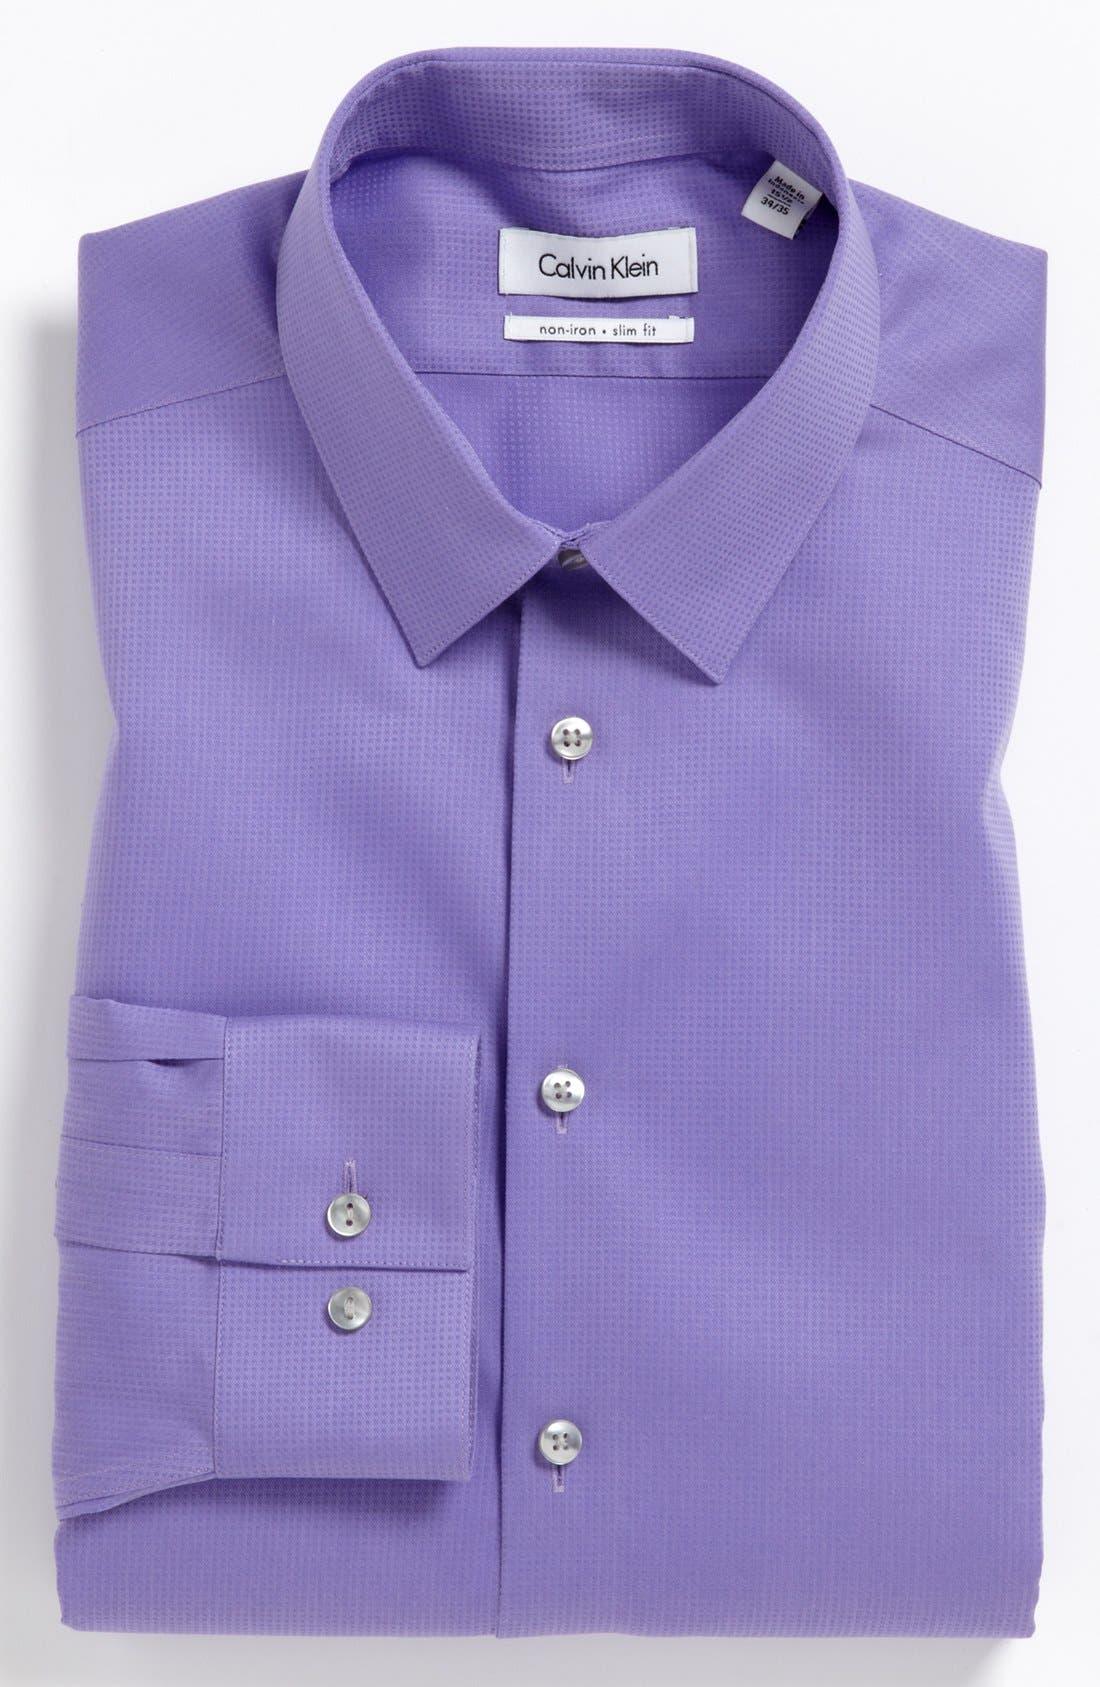 Main Image - Calvin Klein 'Miami Check' Slim Fit Non-Iron Dress Shirt